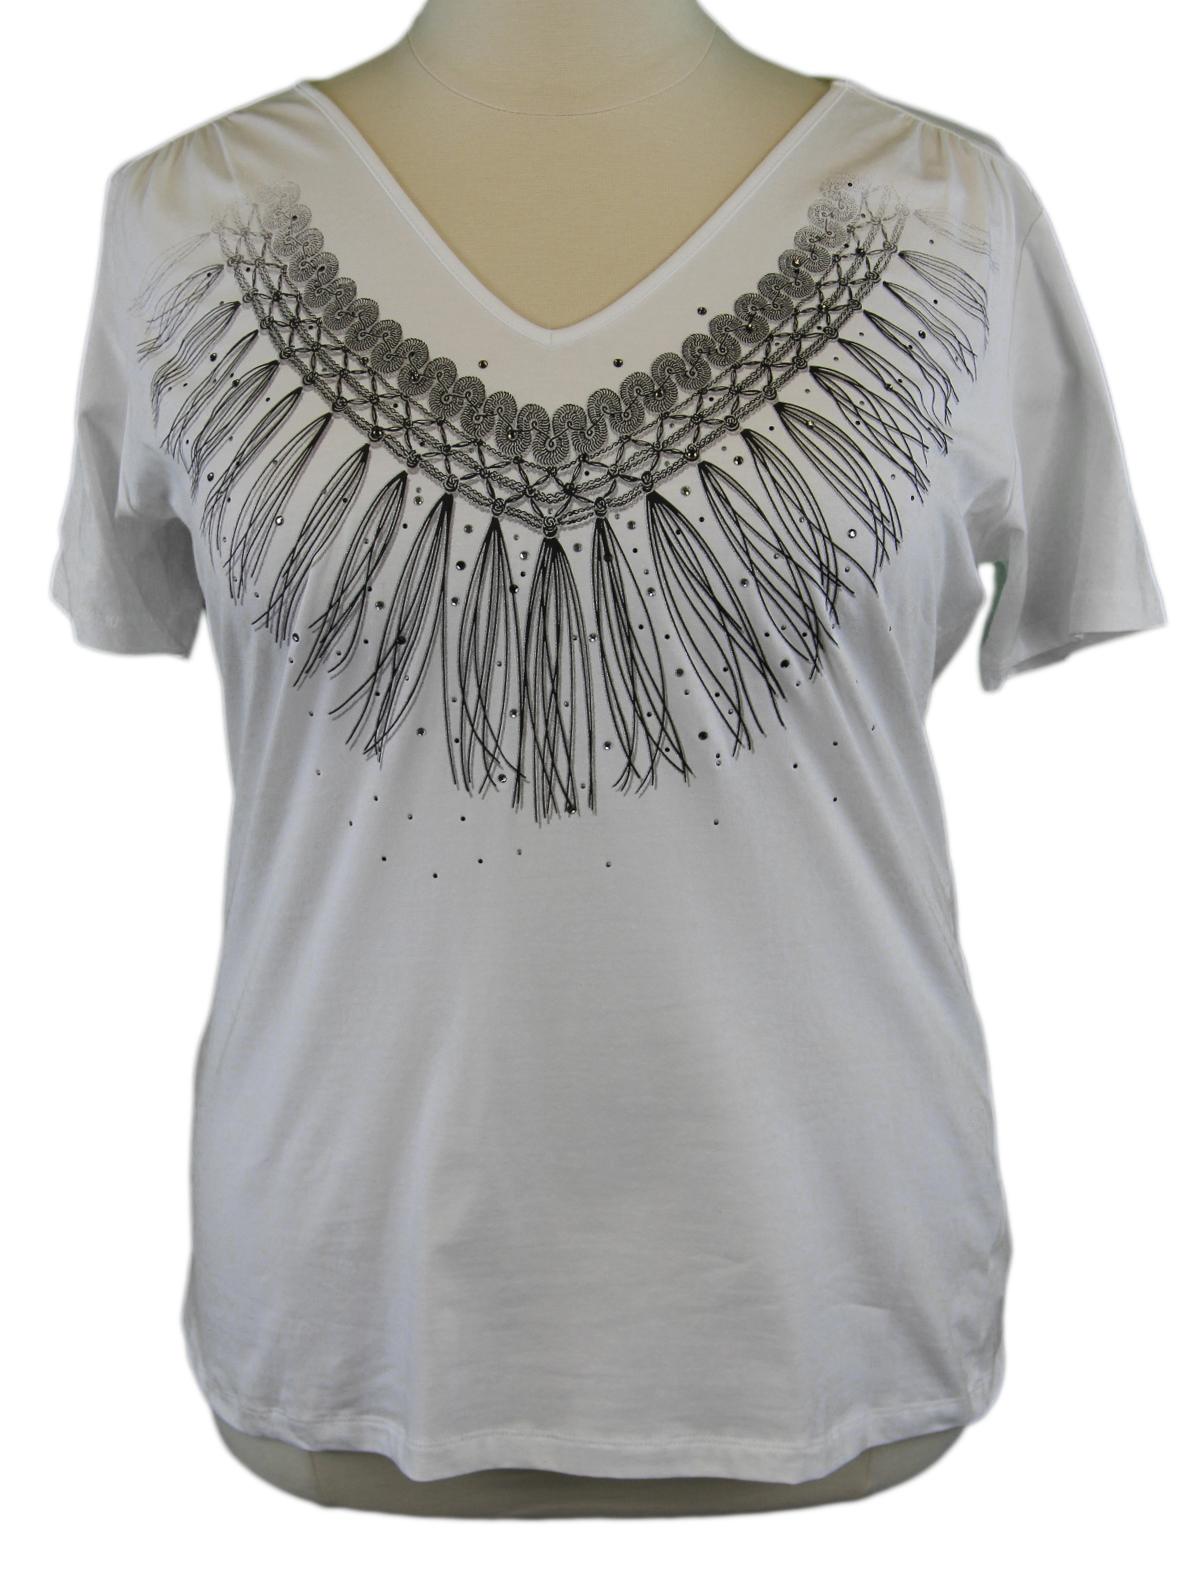 Marina Rinaldi By Maxmara Algone Weiß Quasten Design V-Ausschnitt T-Shirt Nwt